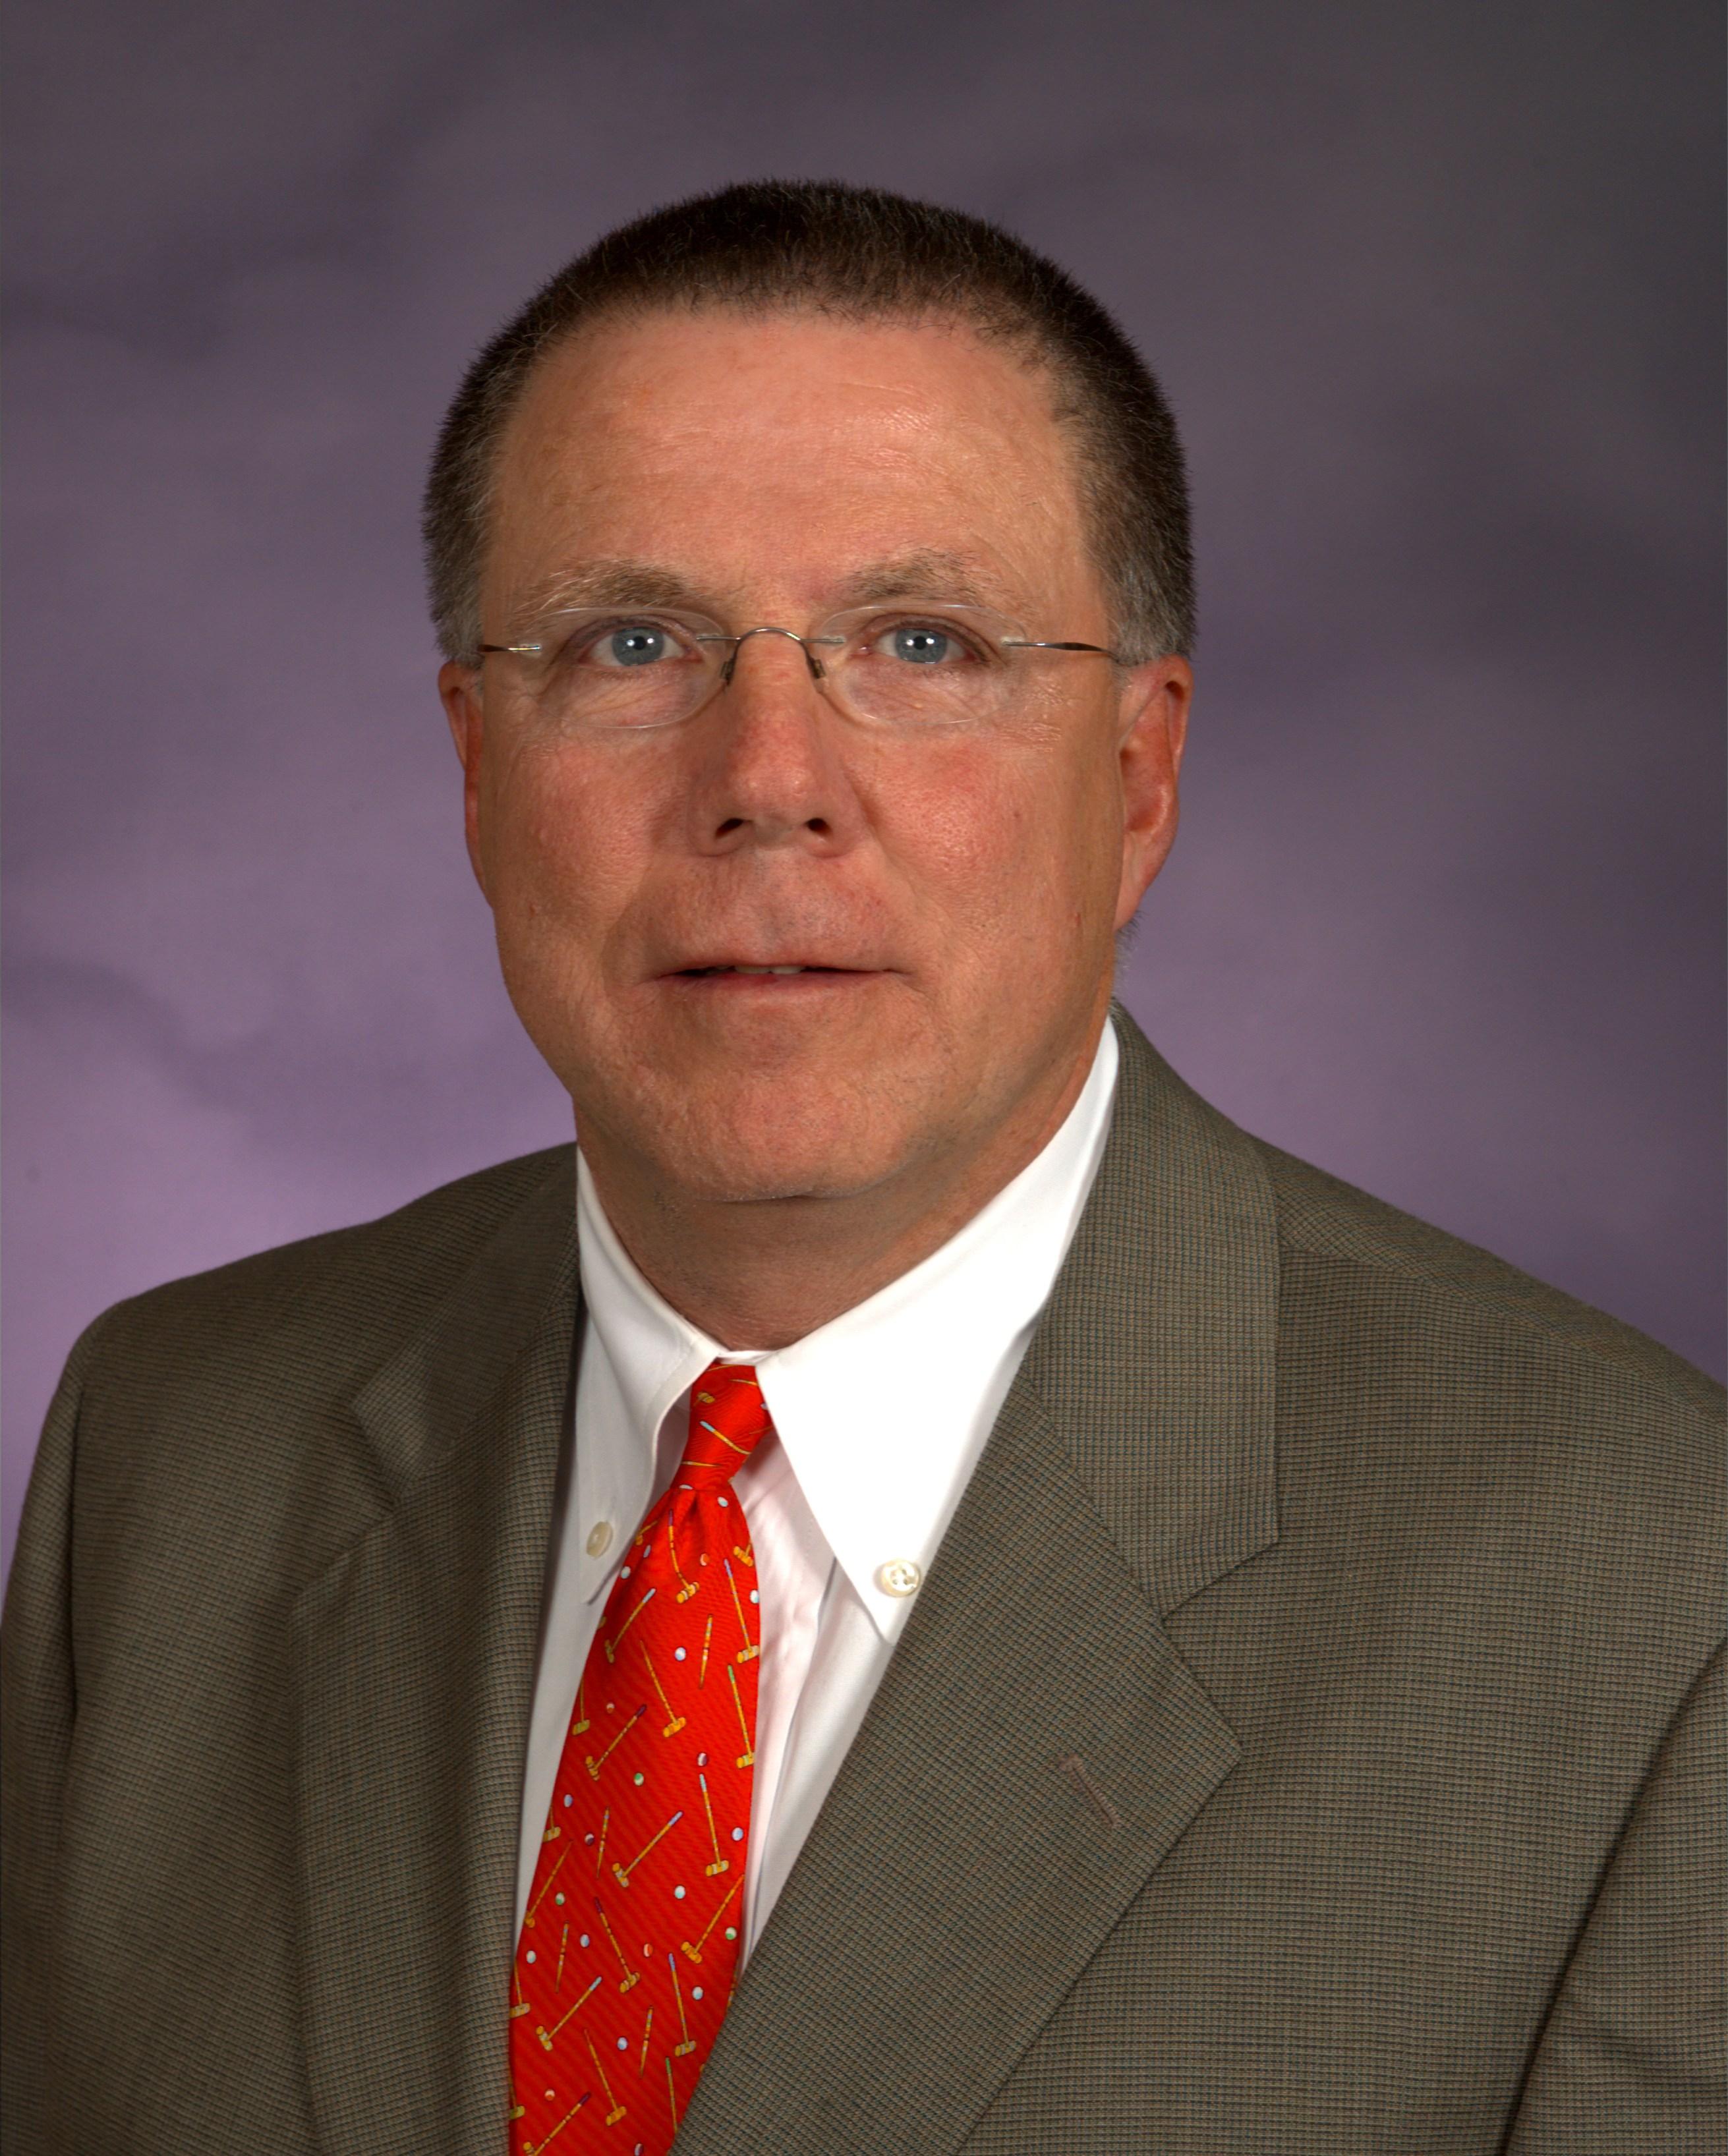 Headshot of Head of School, Ronnie K. Wall